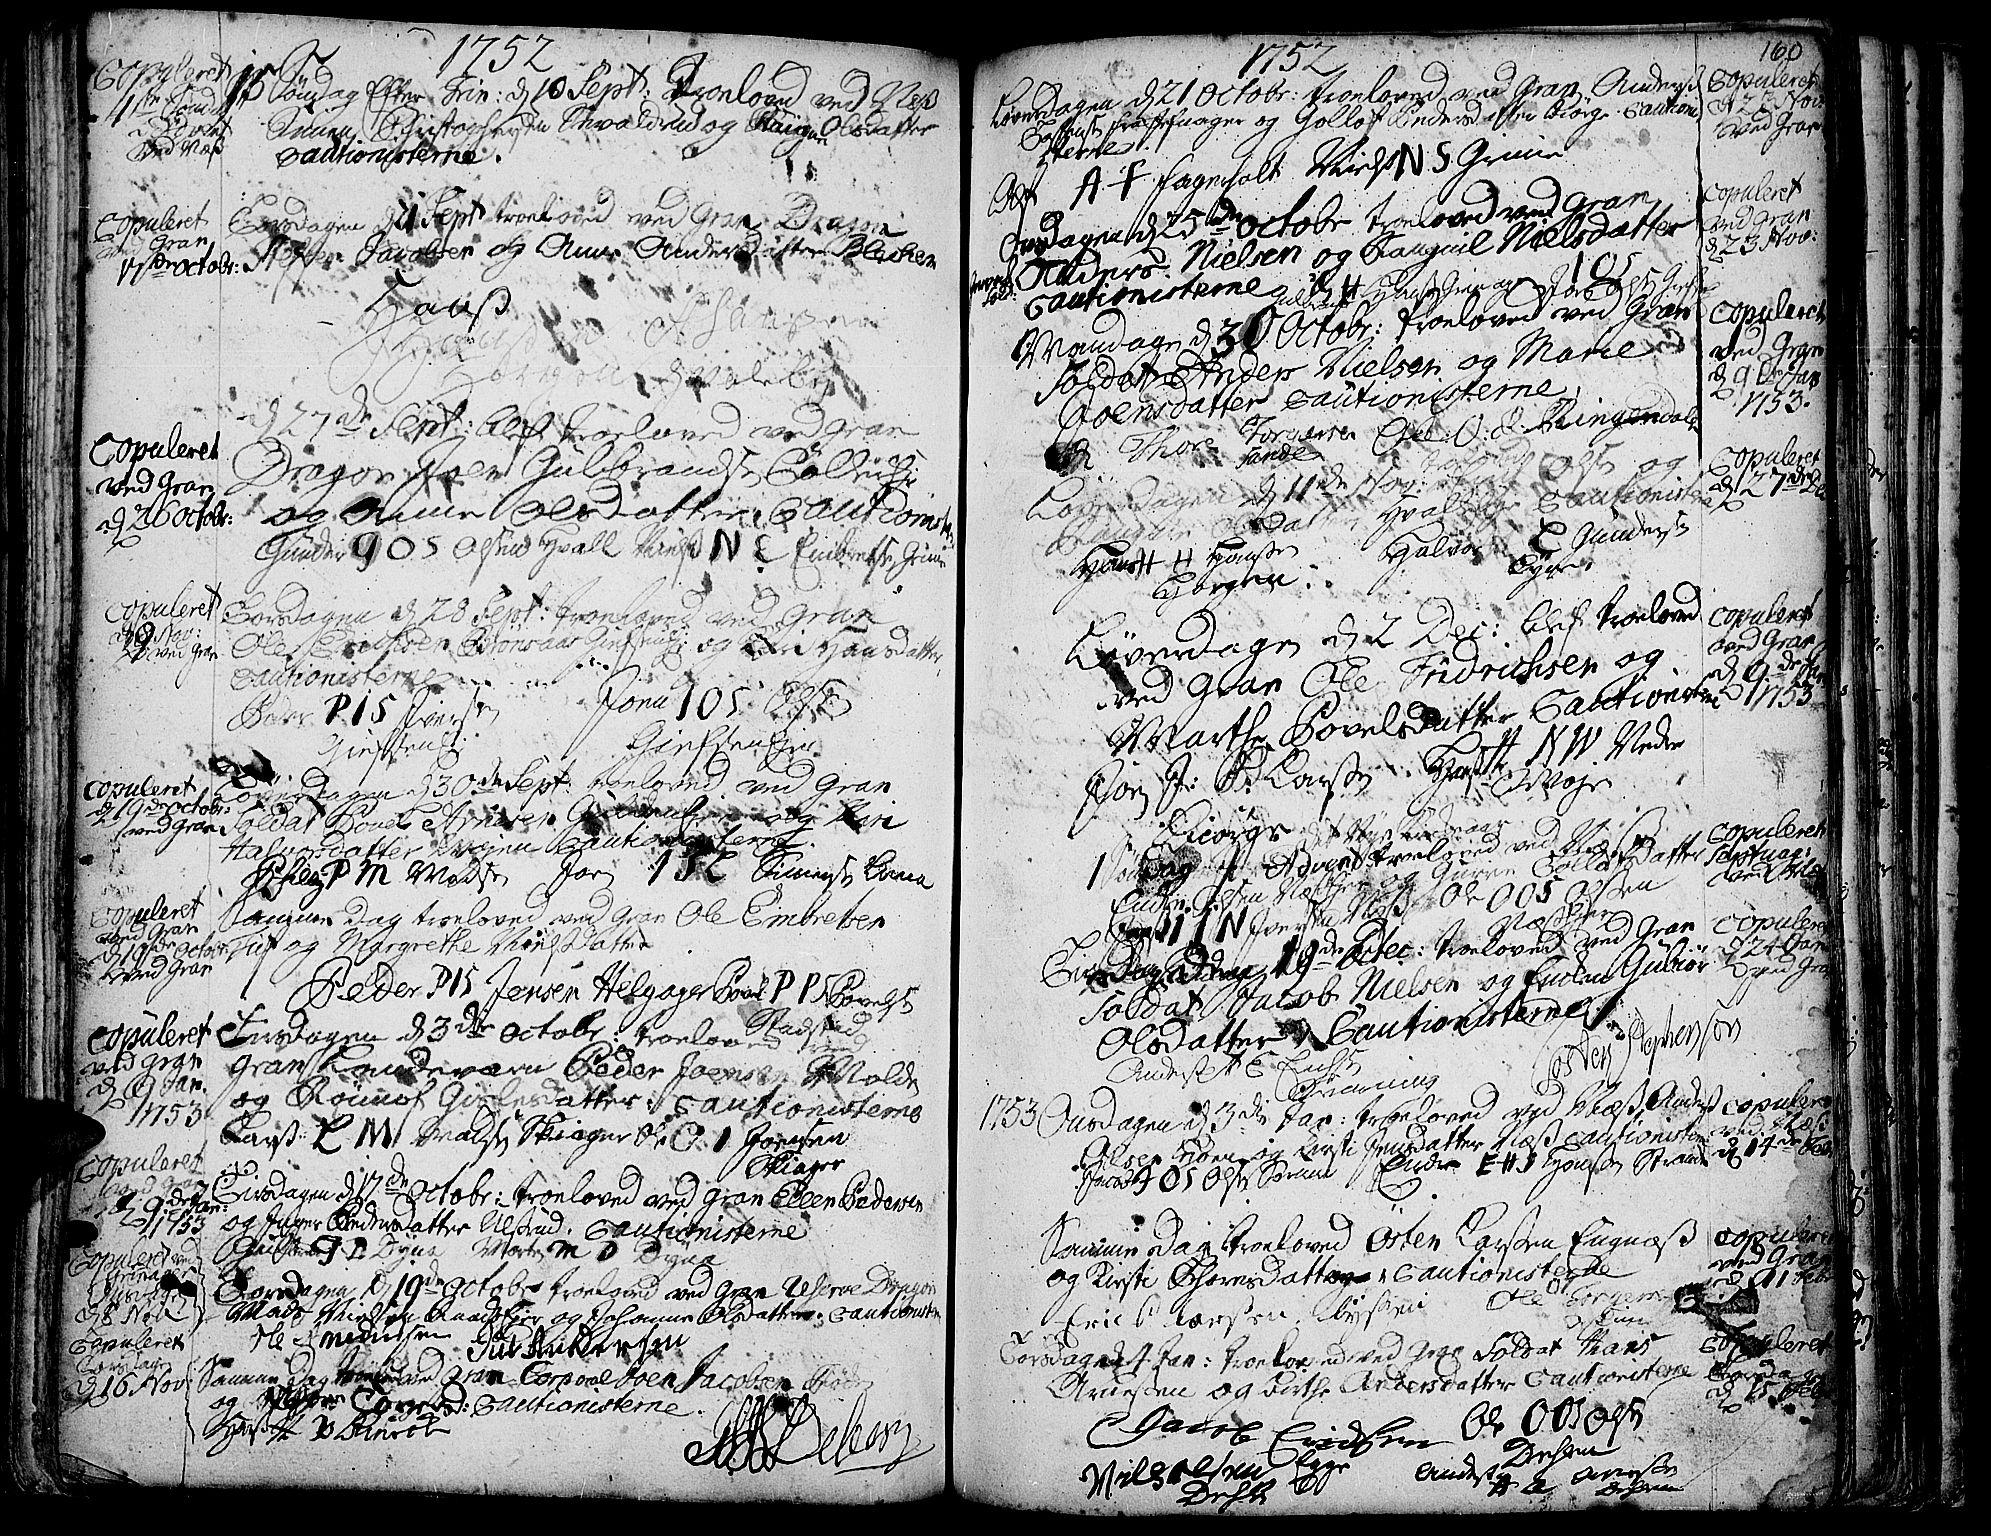 SAH, Gran prestekontor, Ministerialbok nr. 3, 1745-1758, s. 160